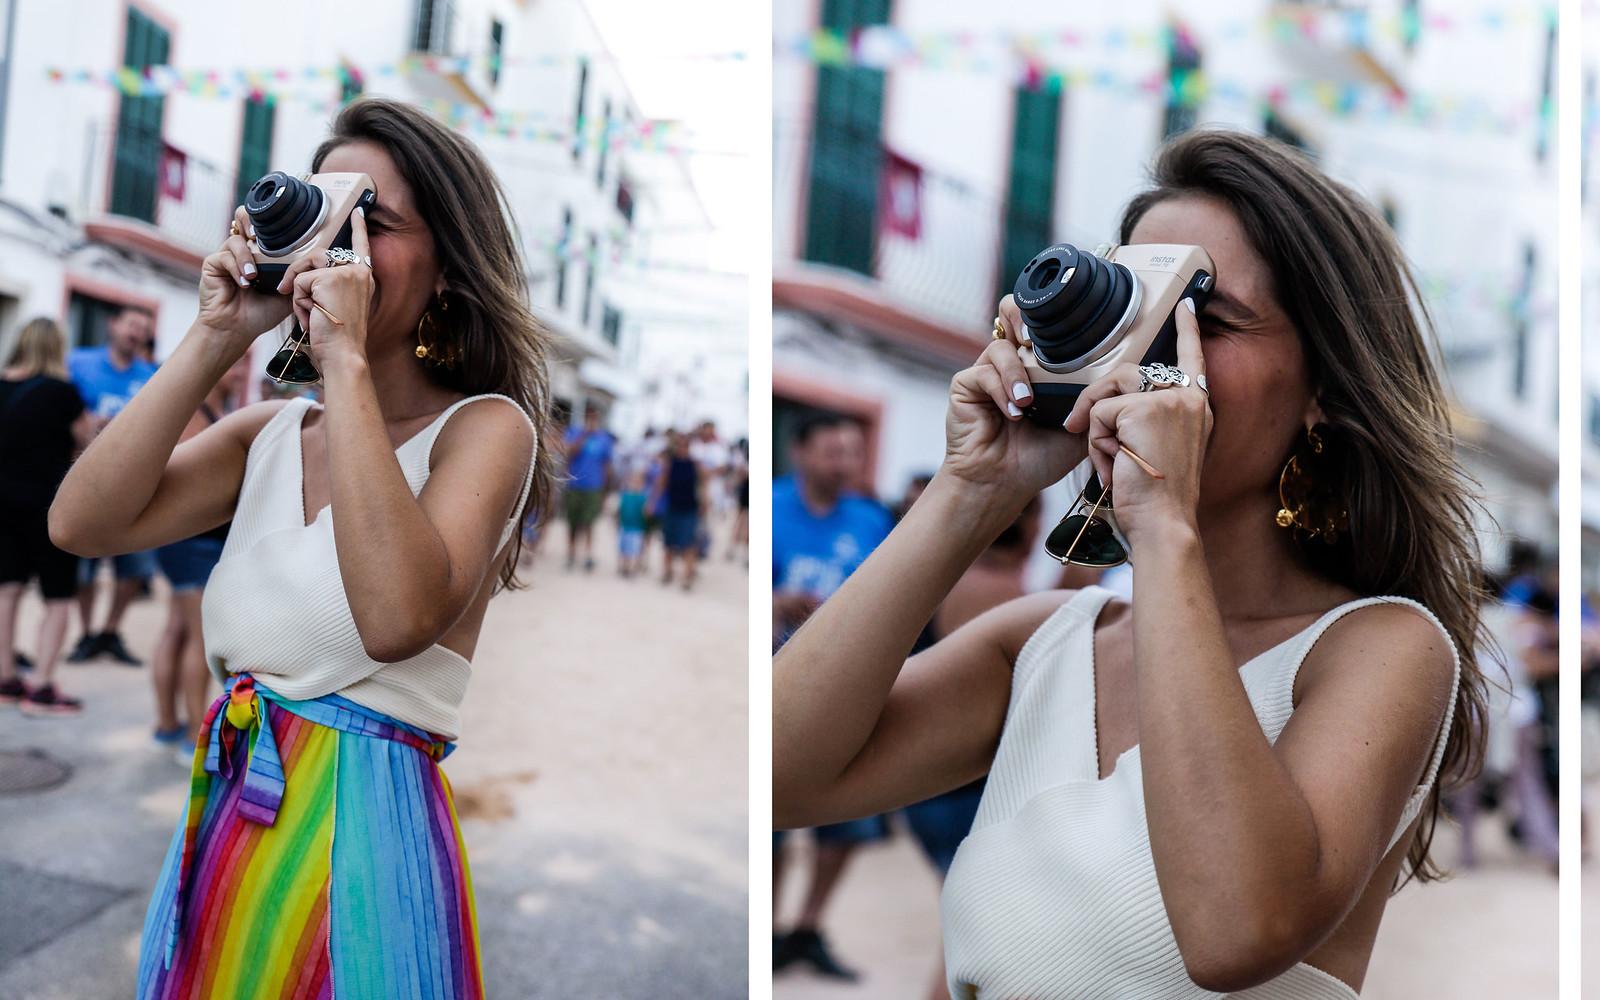 012_falda_arcoiris_top_crudo_look_fiestas_menorca_verano_theguestgirl_fashion_blogger_minorca_summer_laura_santolaria_rayban_sunglasses